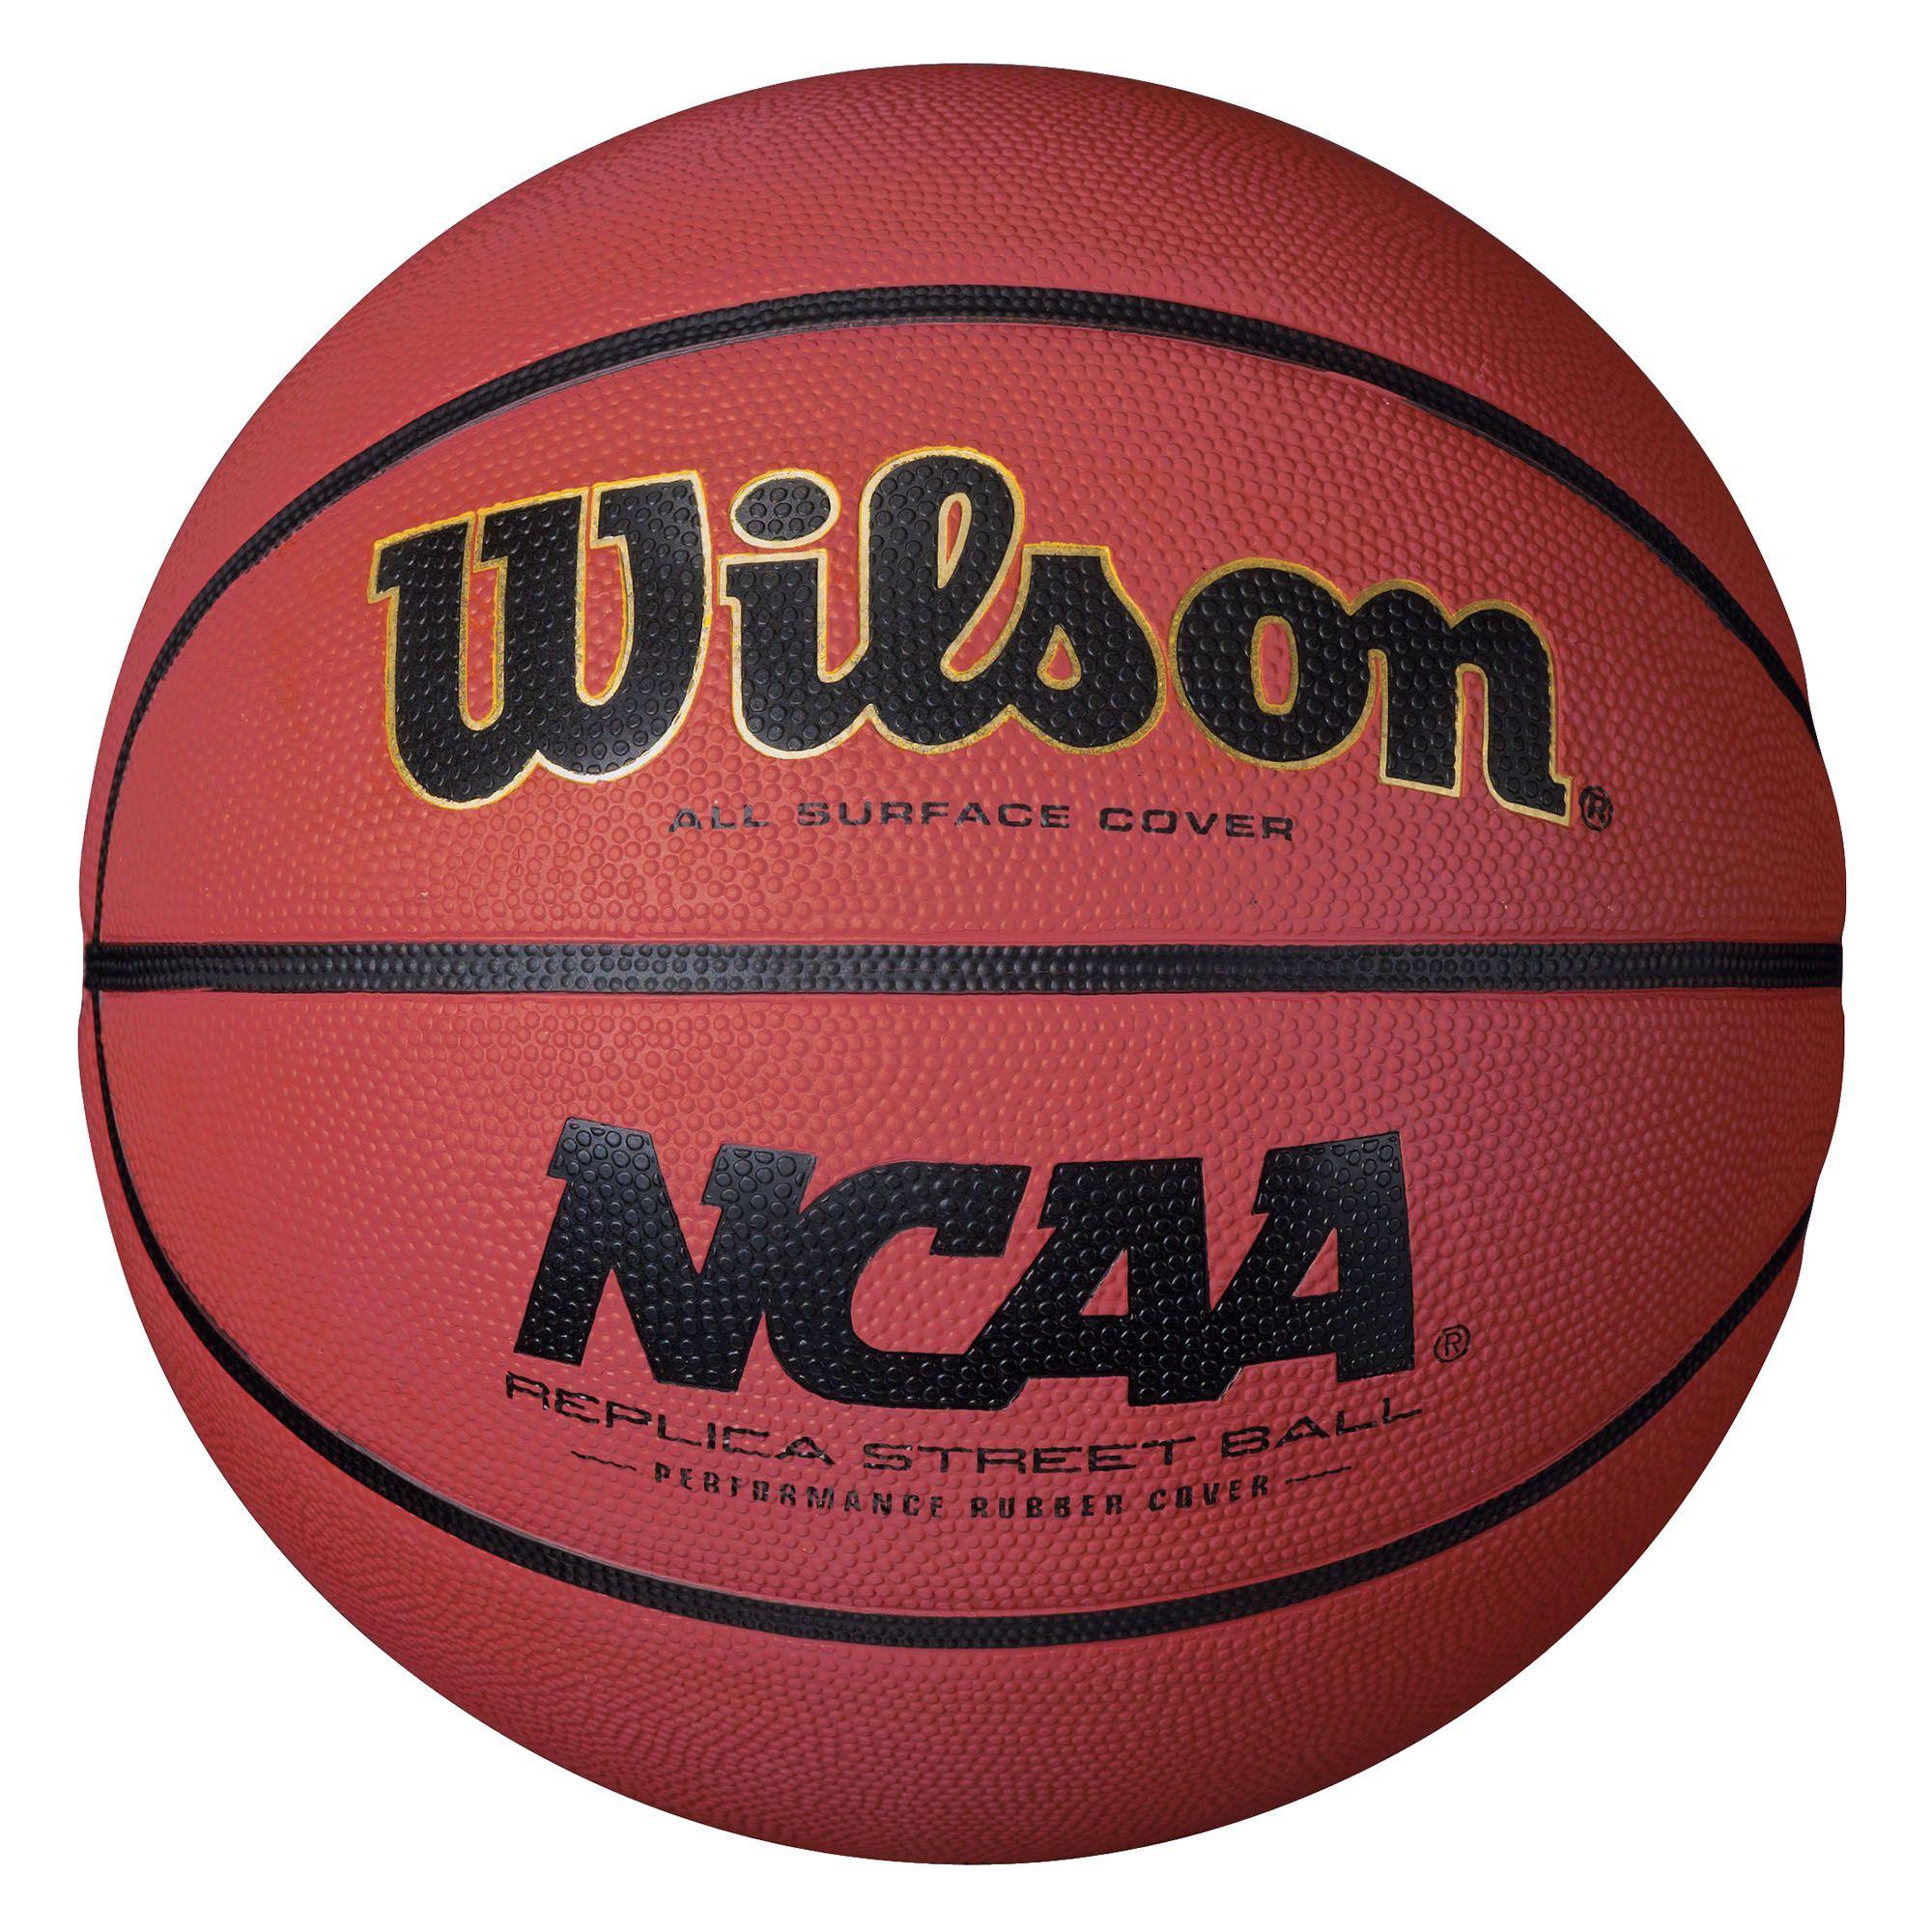 Wilson Ncaa Replica Street Basketball Sweatband Com